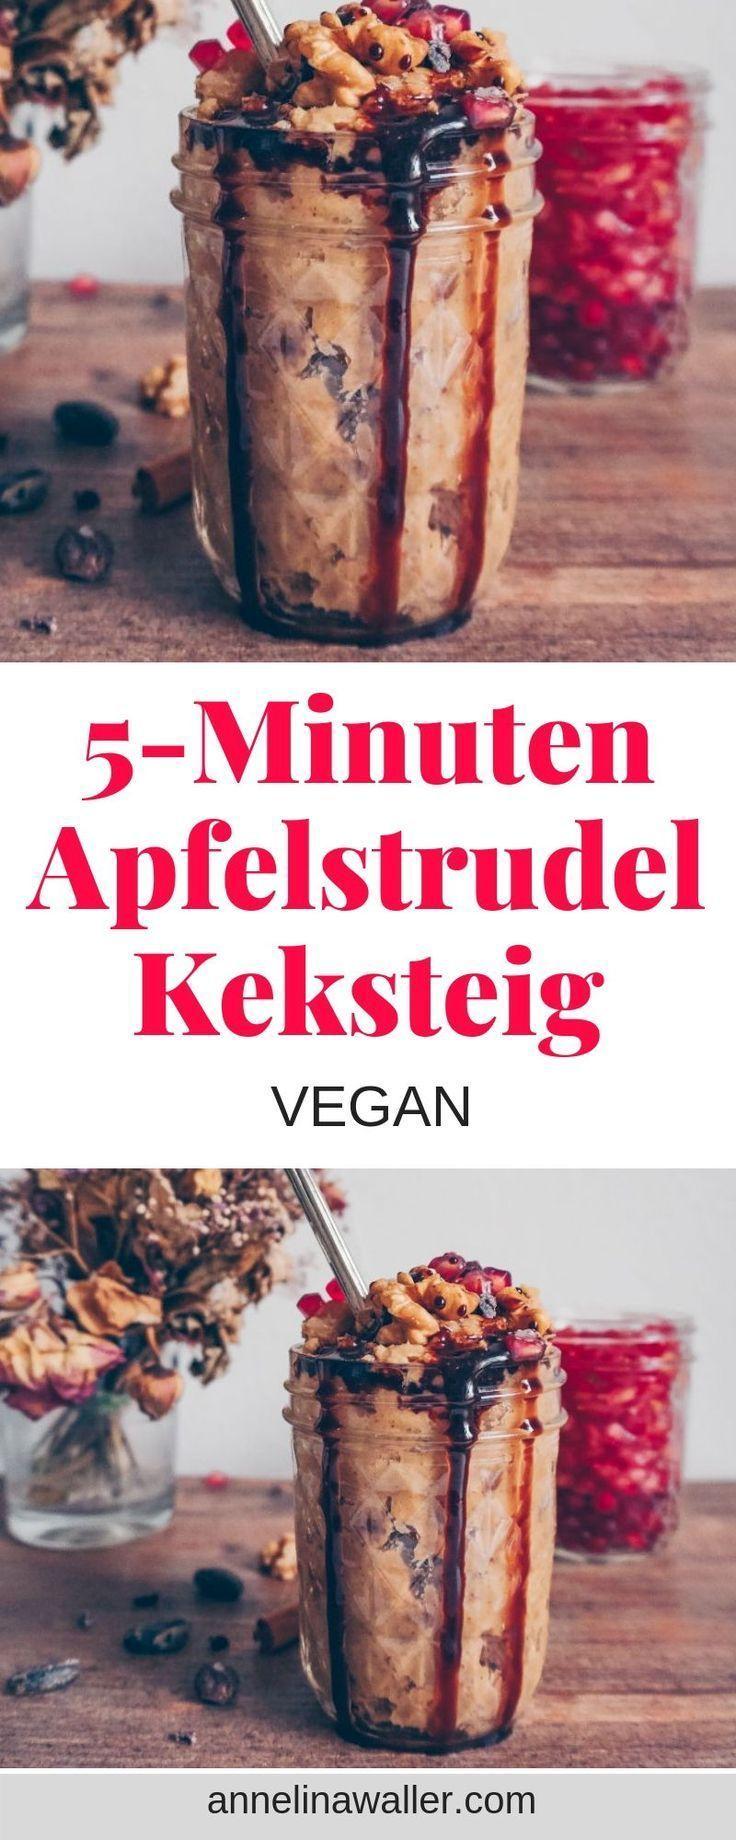 5 Zutaten 5 Minuten Apfelstrudel Keksteig #veganerezeptemittag